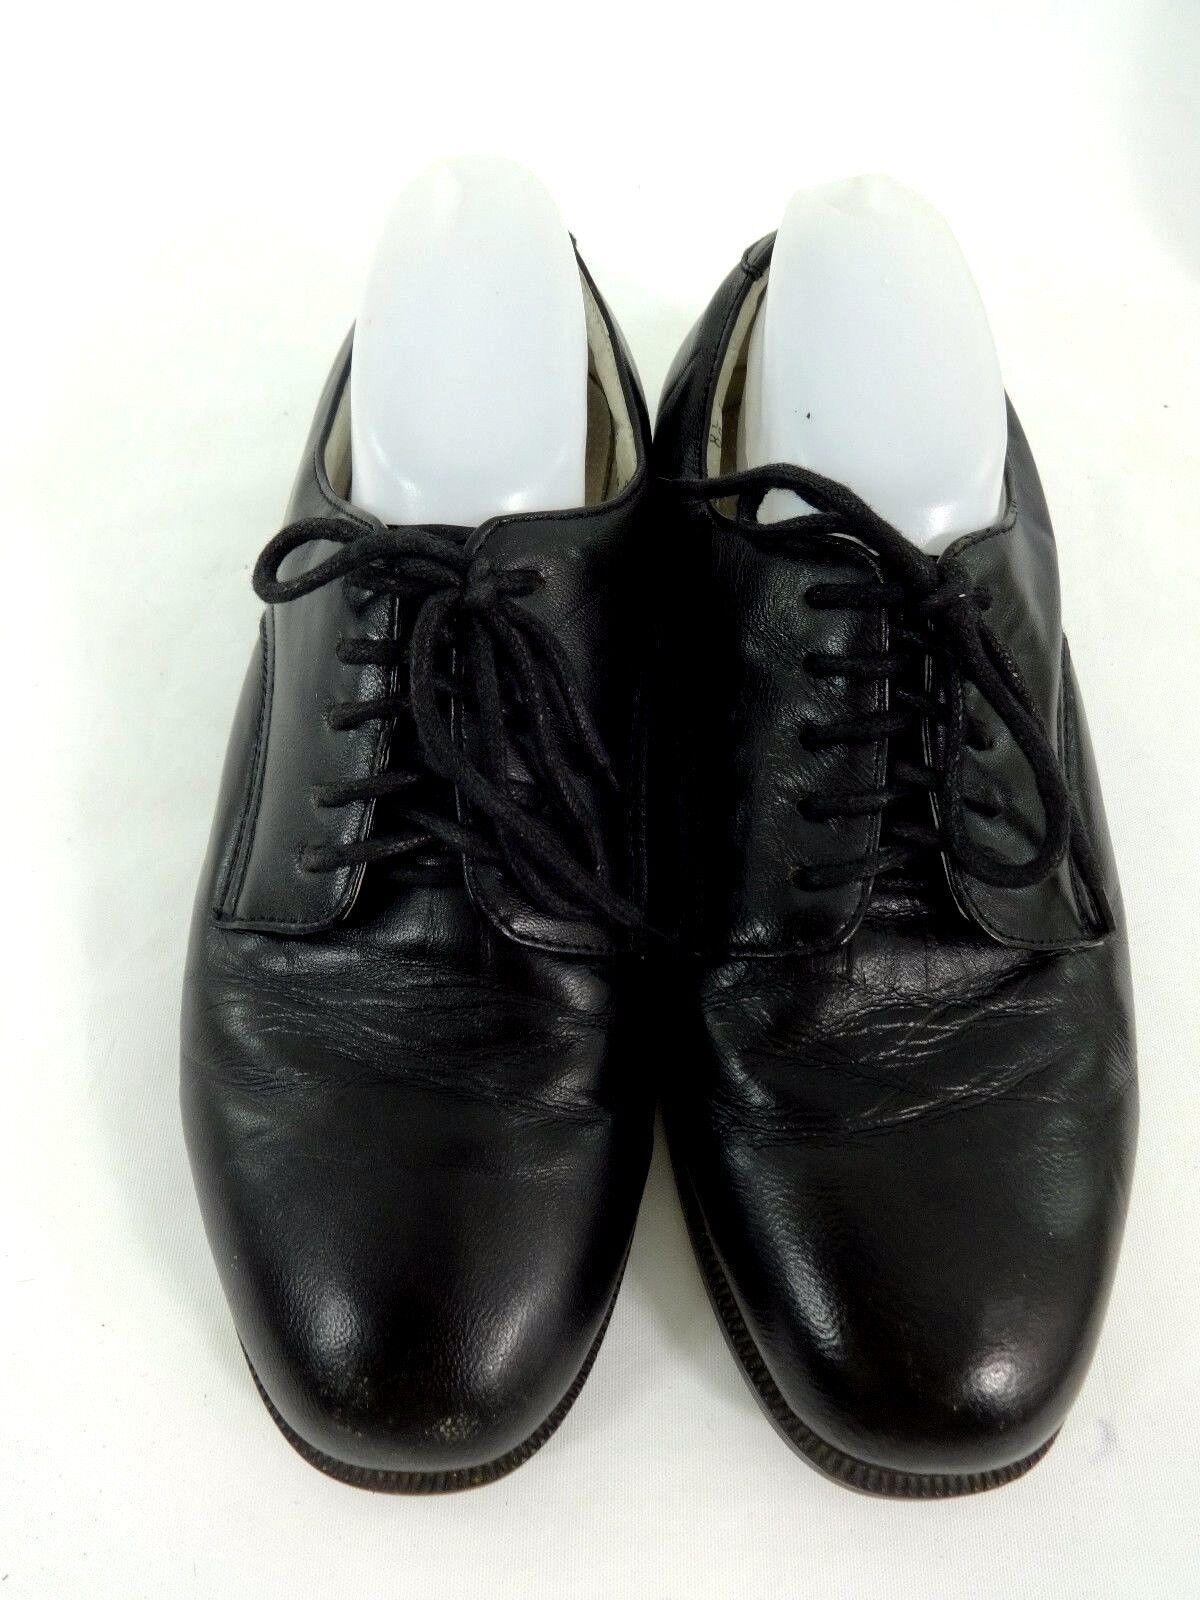 AMBASSADOR MENS BLACK LEATHER COMFORT OXFORDS DRESS SHOES SIZE 8.5 M